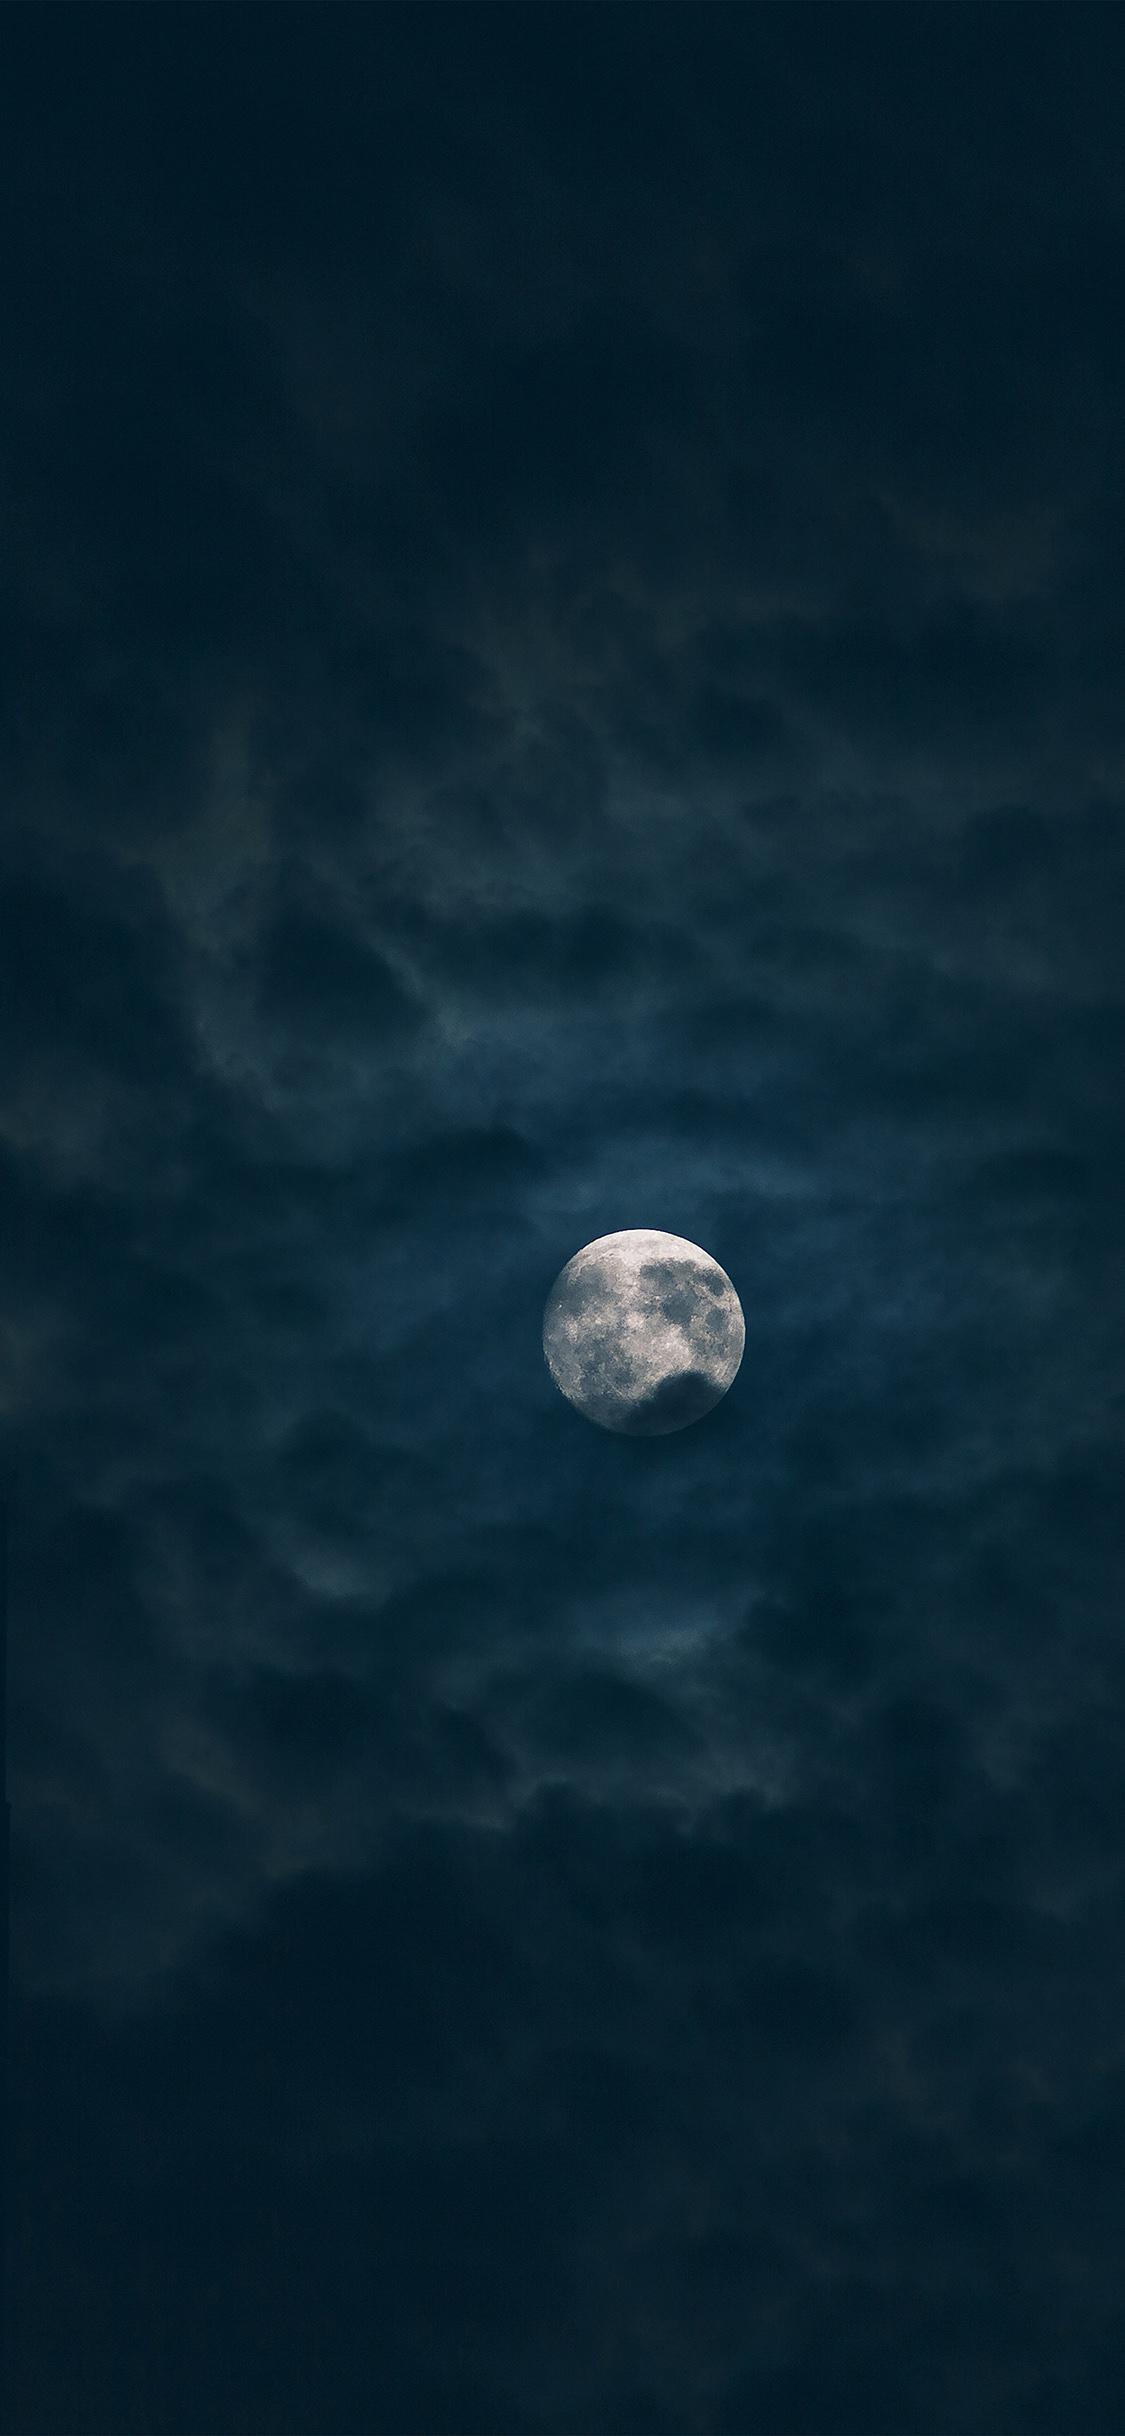 celestial sun and moon iphone wallpaper 80838 interiordesign